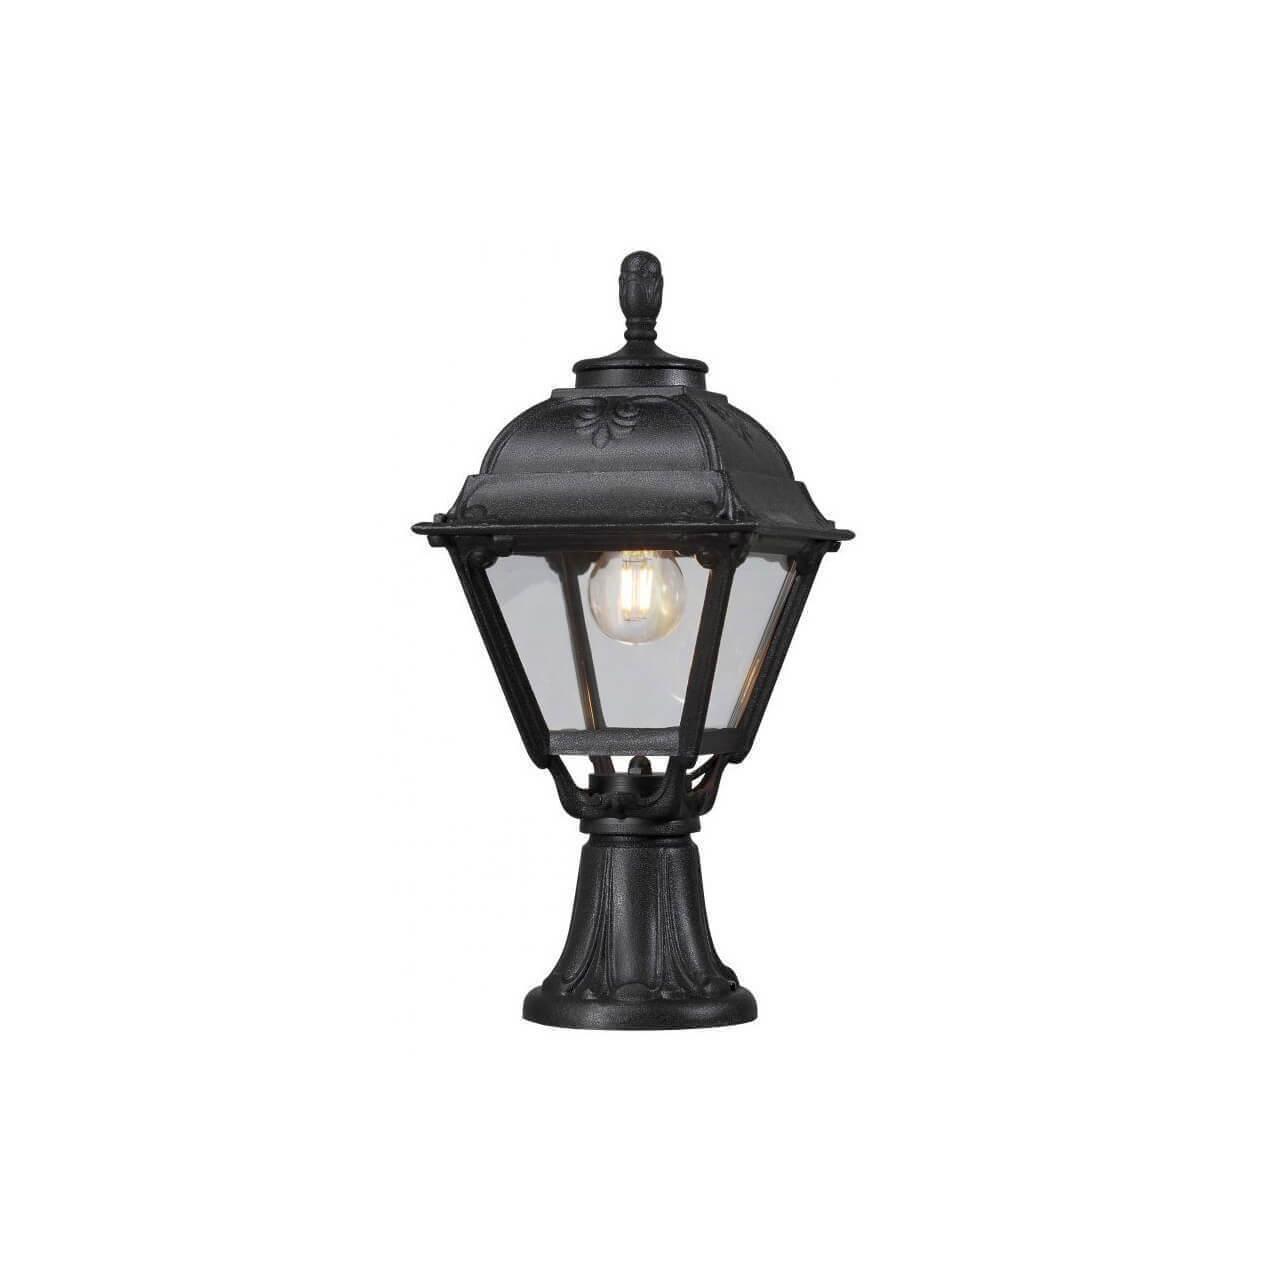 Уличный светильник Fumagalli Minilot/Cefa U23.111.000.AXF1R